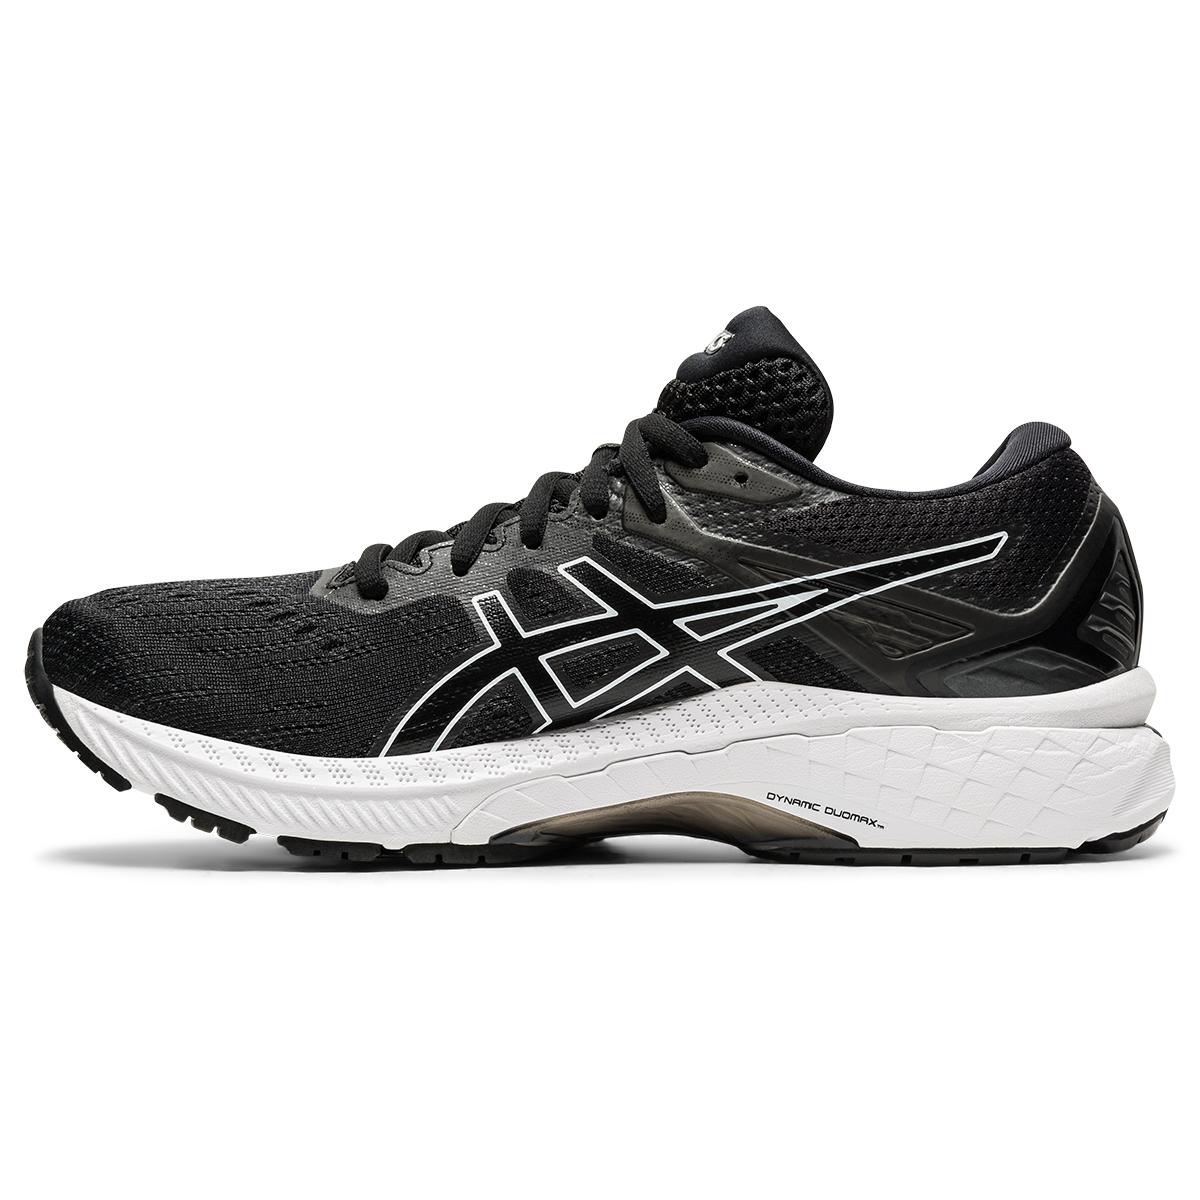 Women's Asics Gt-2000 9 Running Shoe - Color: Black/White - Size: 5 - Width: Regular, Black/White, large, image 2